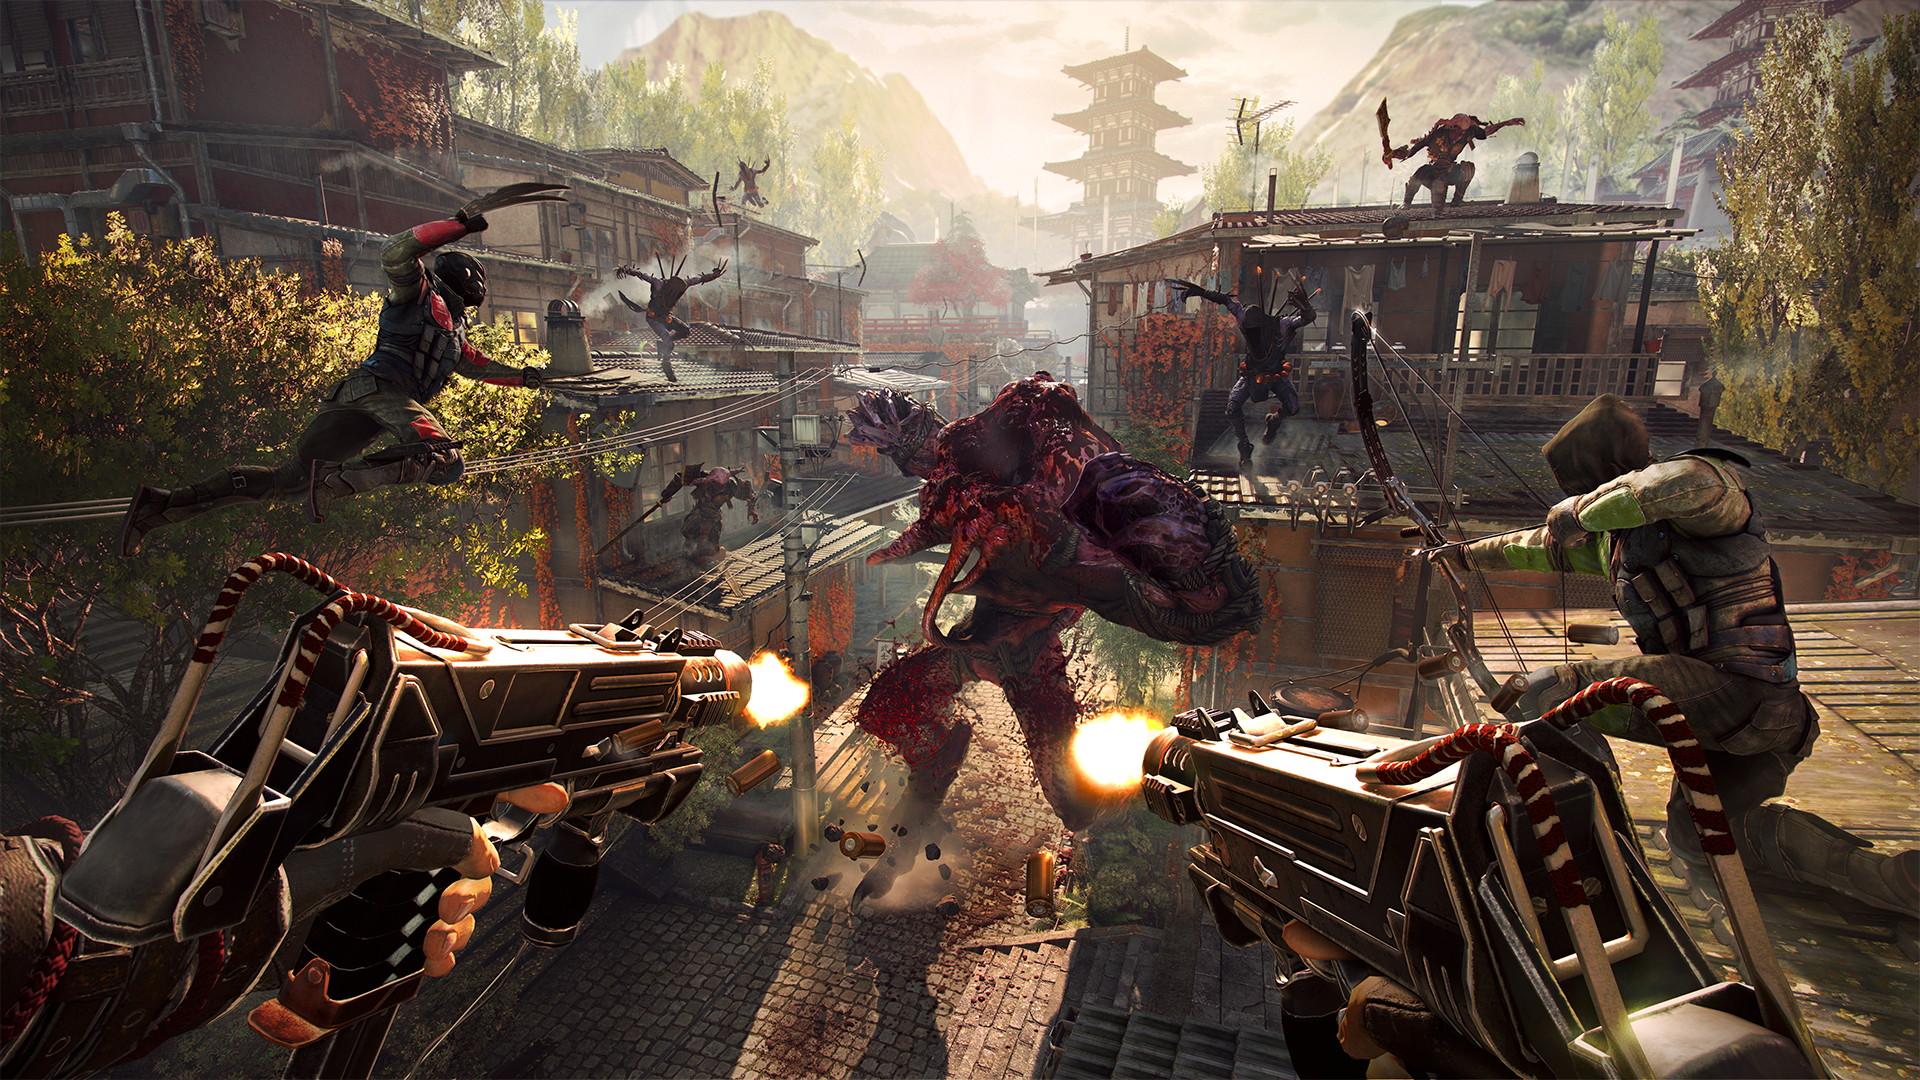 Shadow_Warrior_2 _Debut_Screenshot_01.jpg